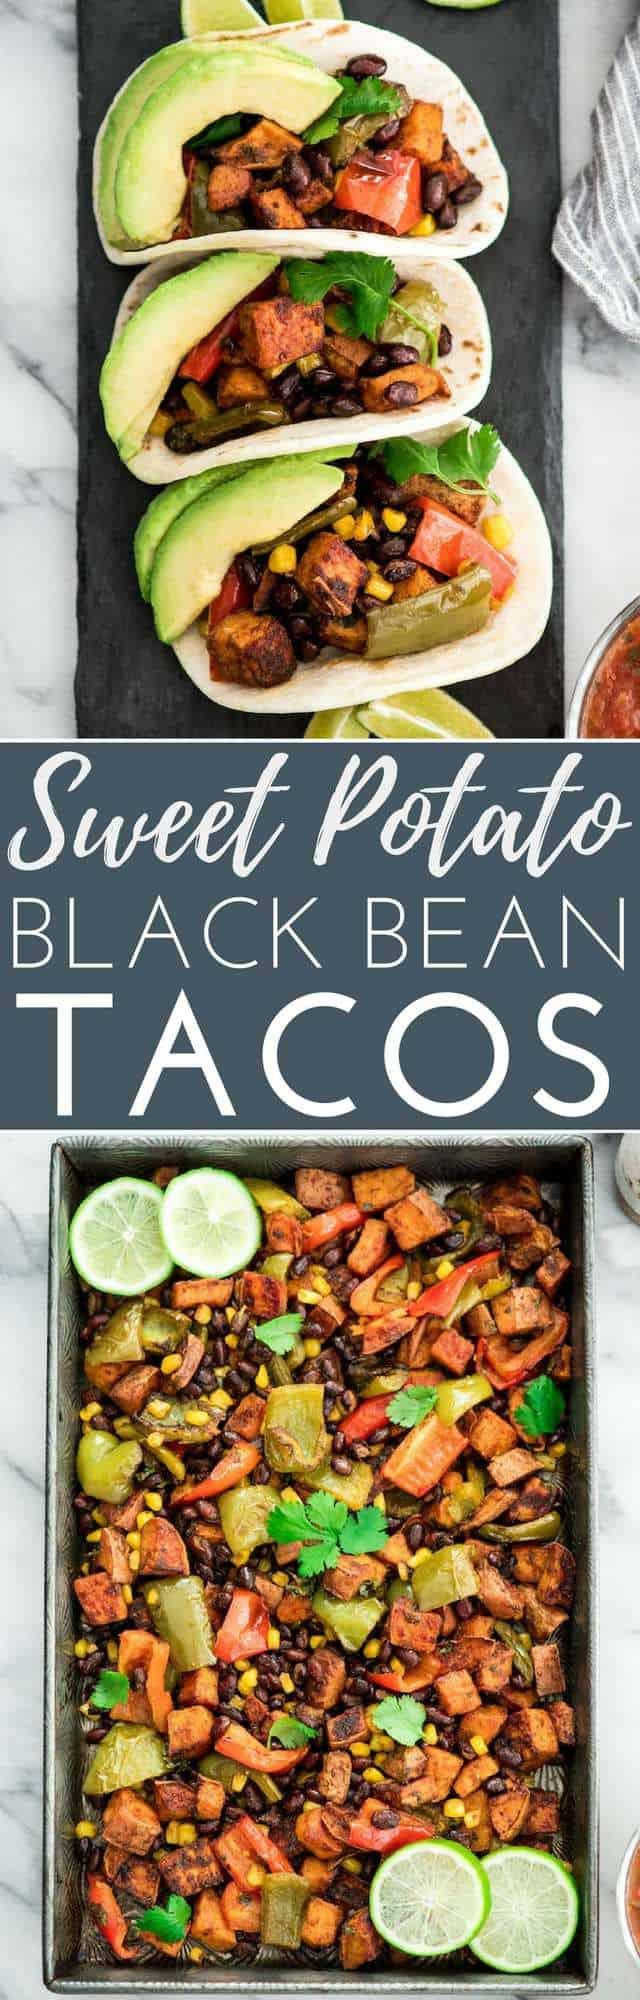 Honey Lime Roasted Black Bean Sweet Potato Tacos are the perfect vegetarian recipe for taco nights!  #glutenfree #vegetarian #tacos #sweetpotatoes #healthyrecipe #dairyfree #blackbeans #tacotuesday #taconight #eatseasonal